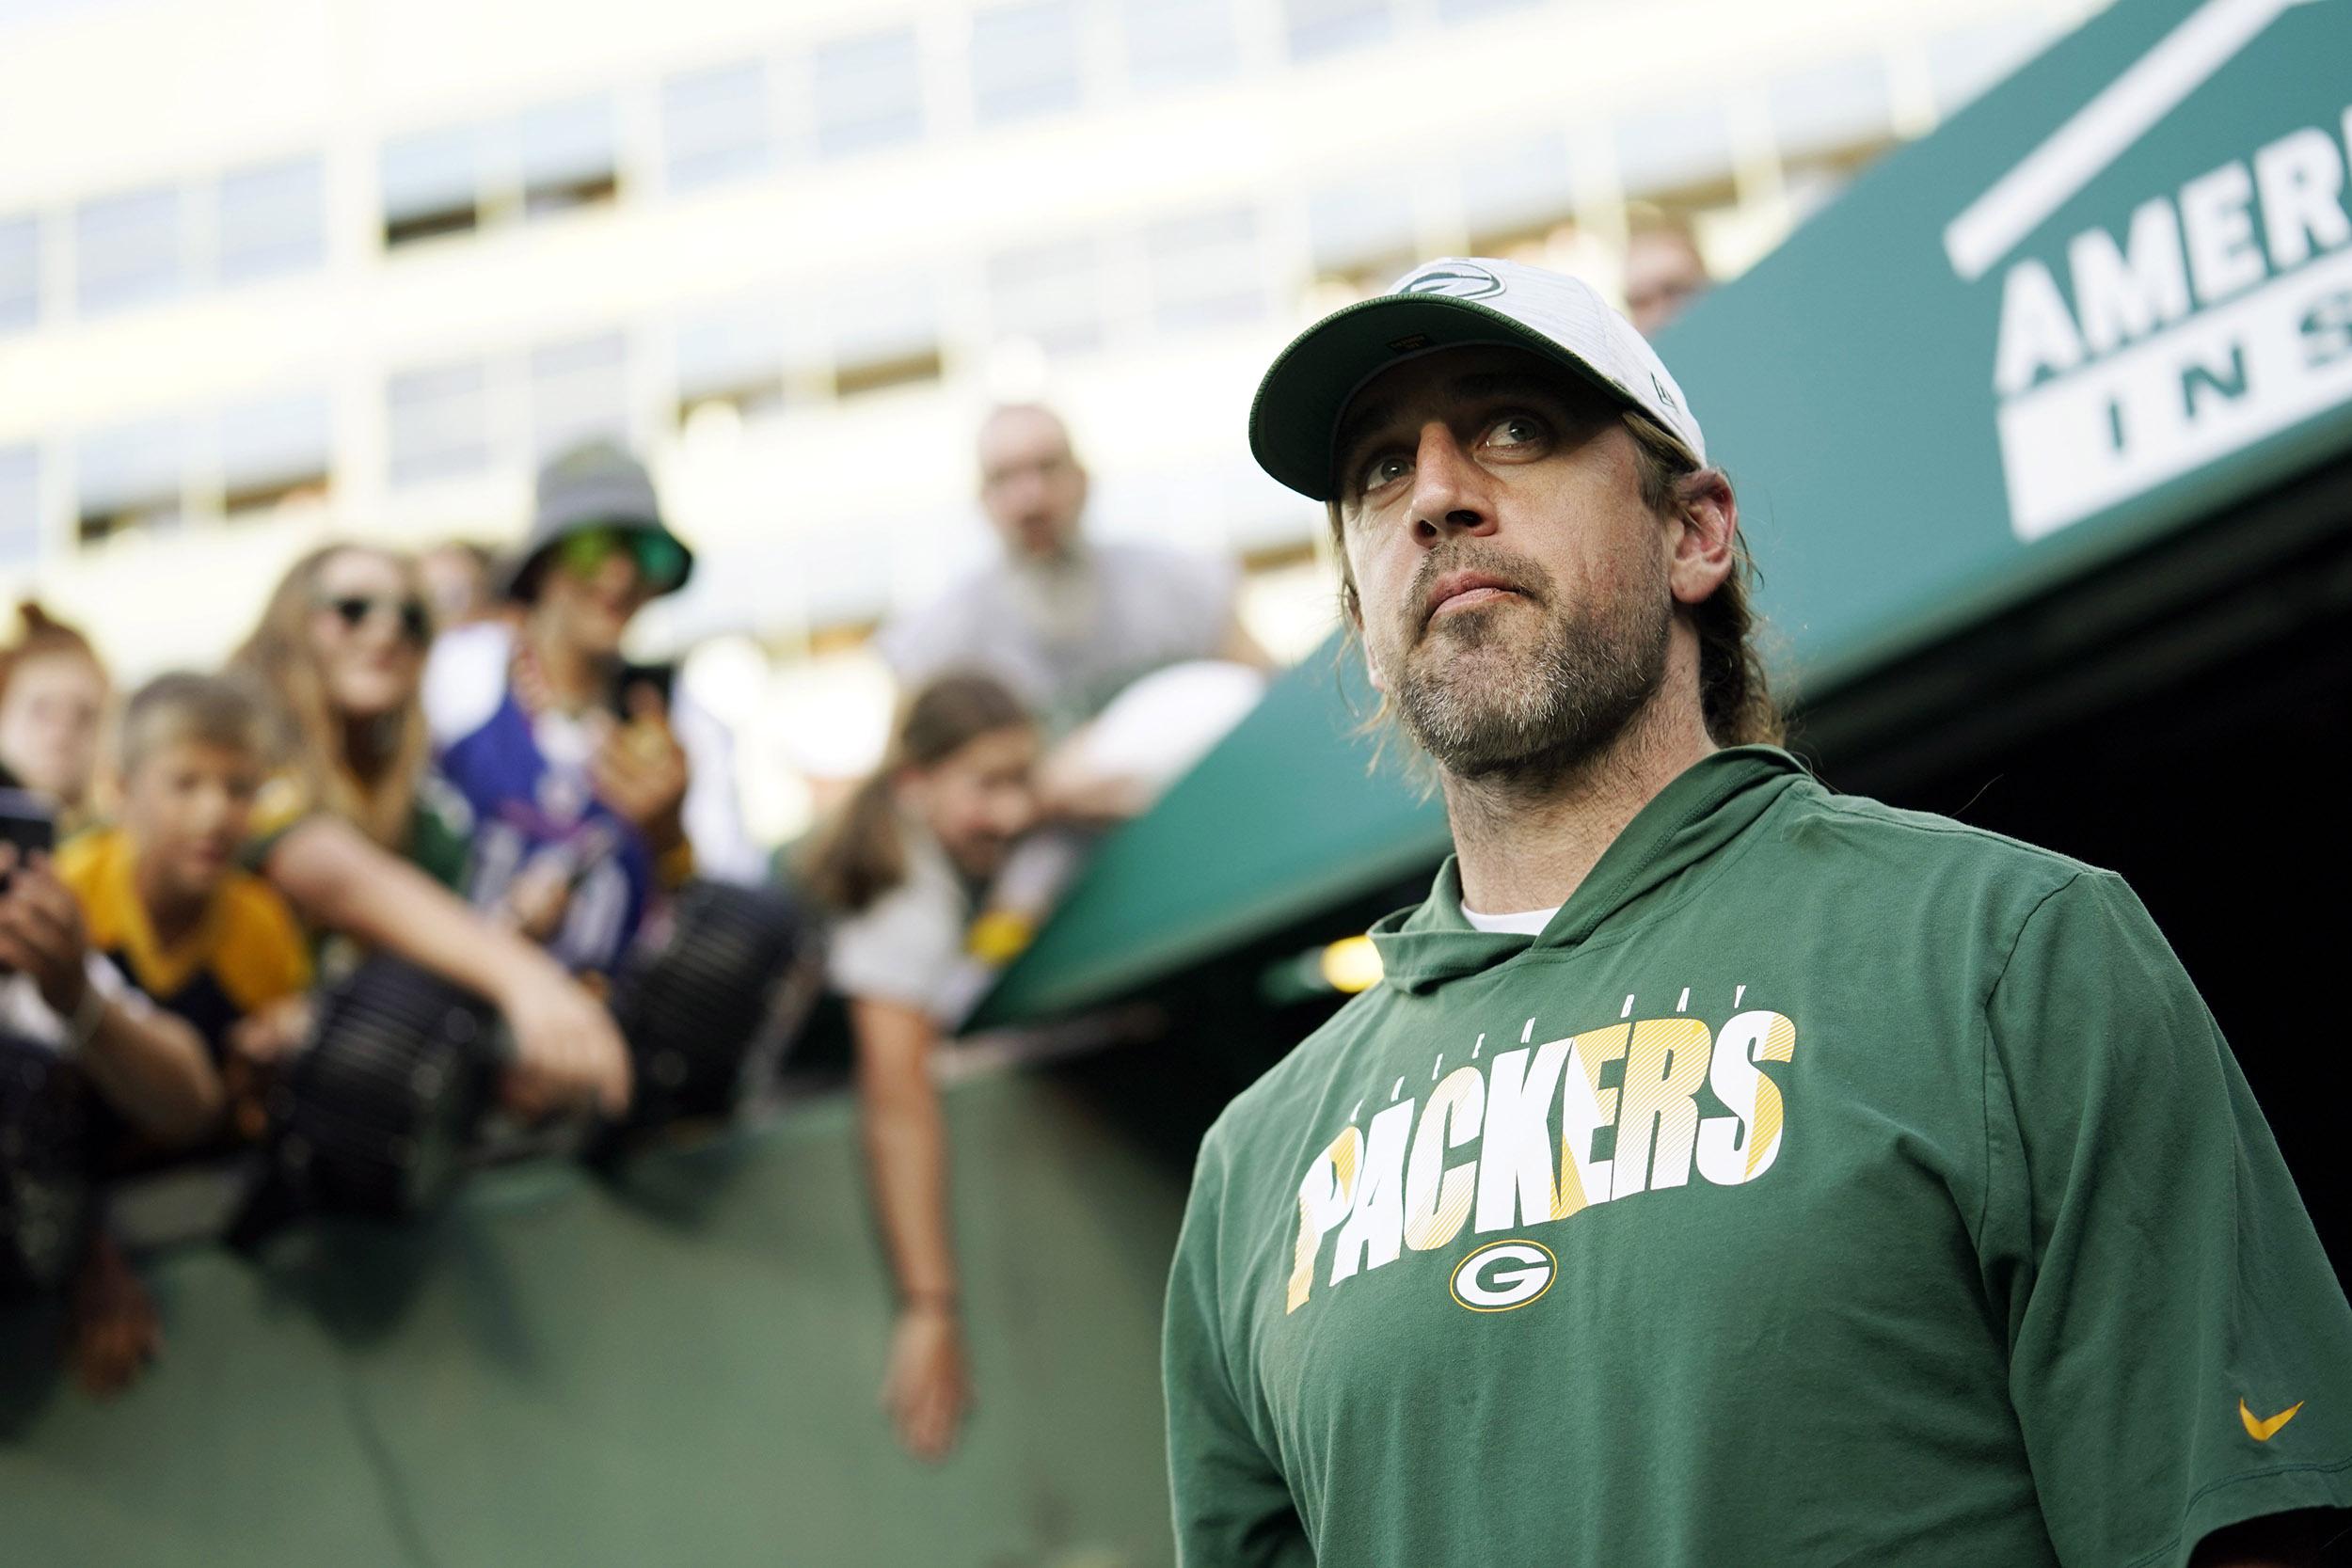 After summer turmoil, Aaron Rodgers takes zen approach to Packers season